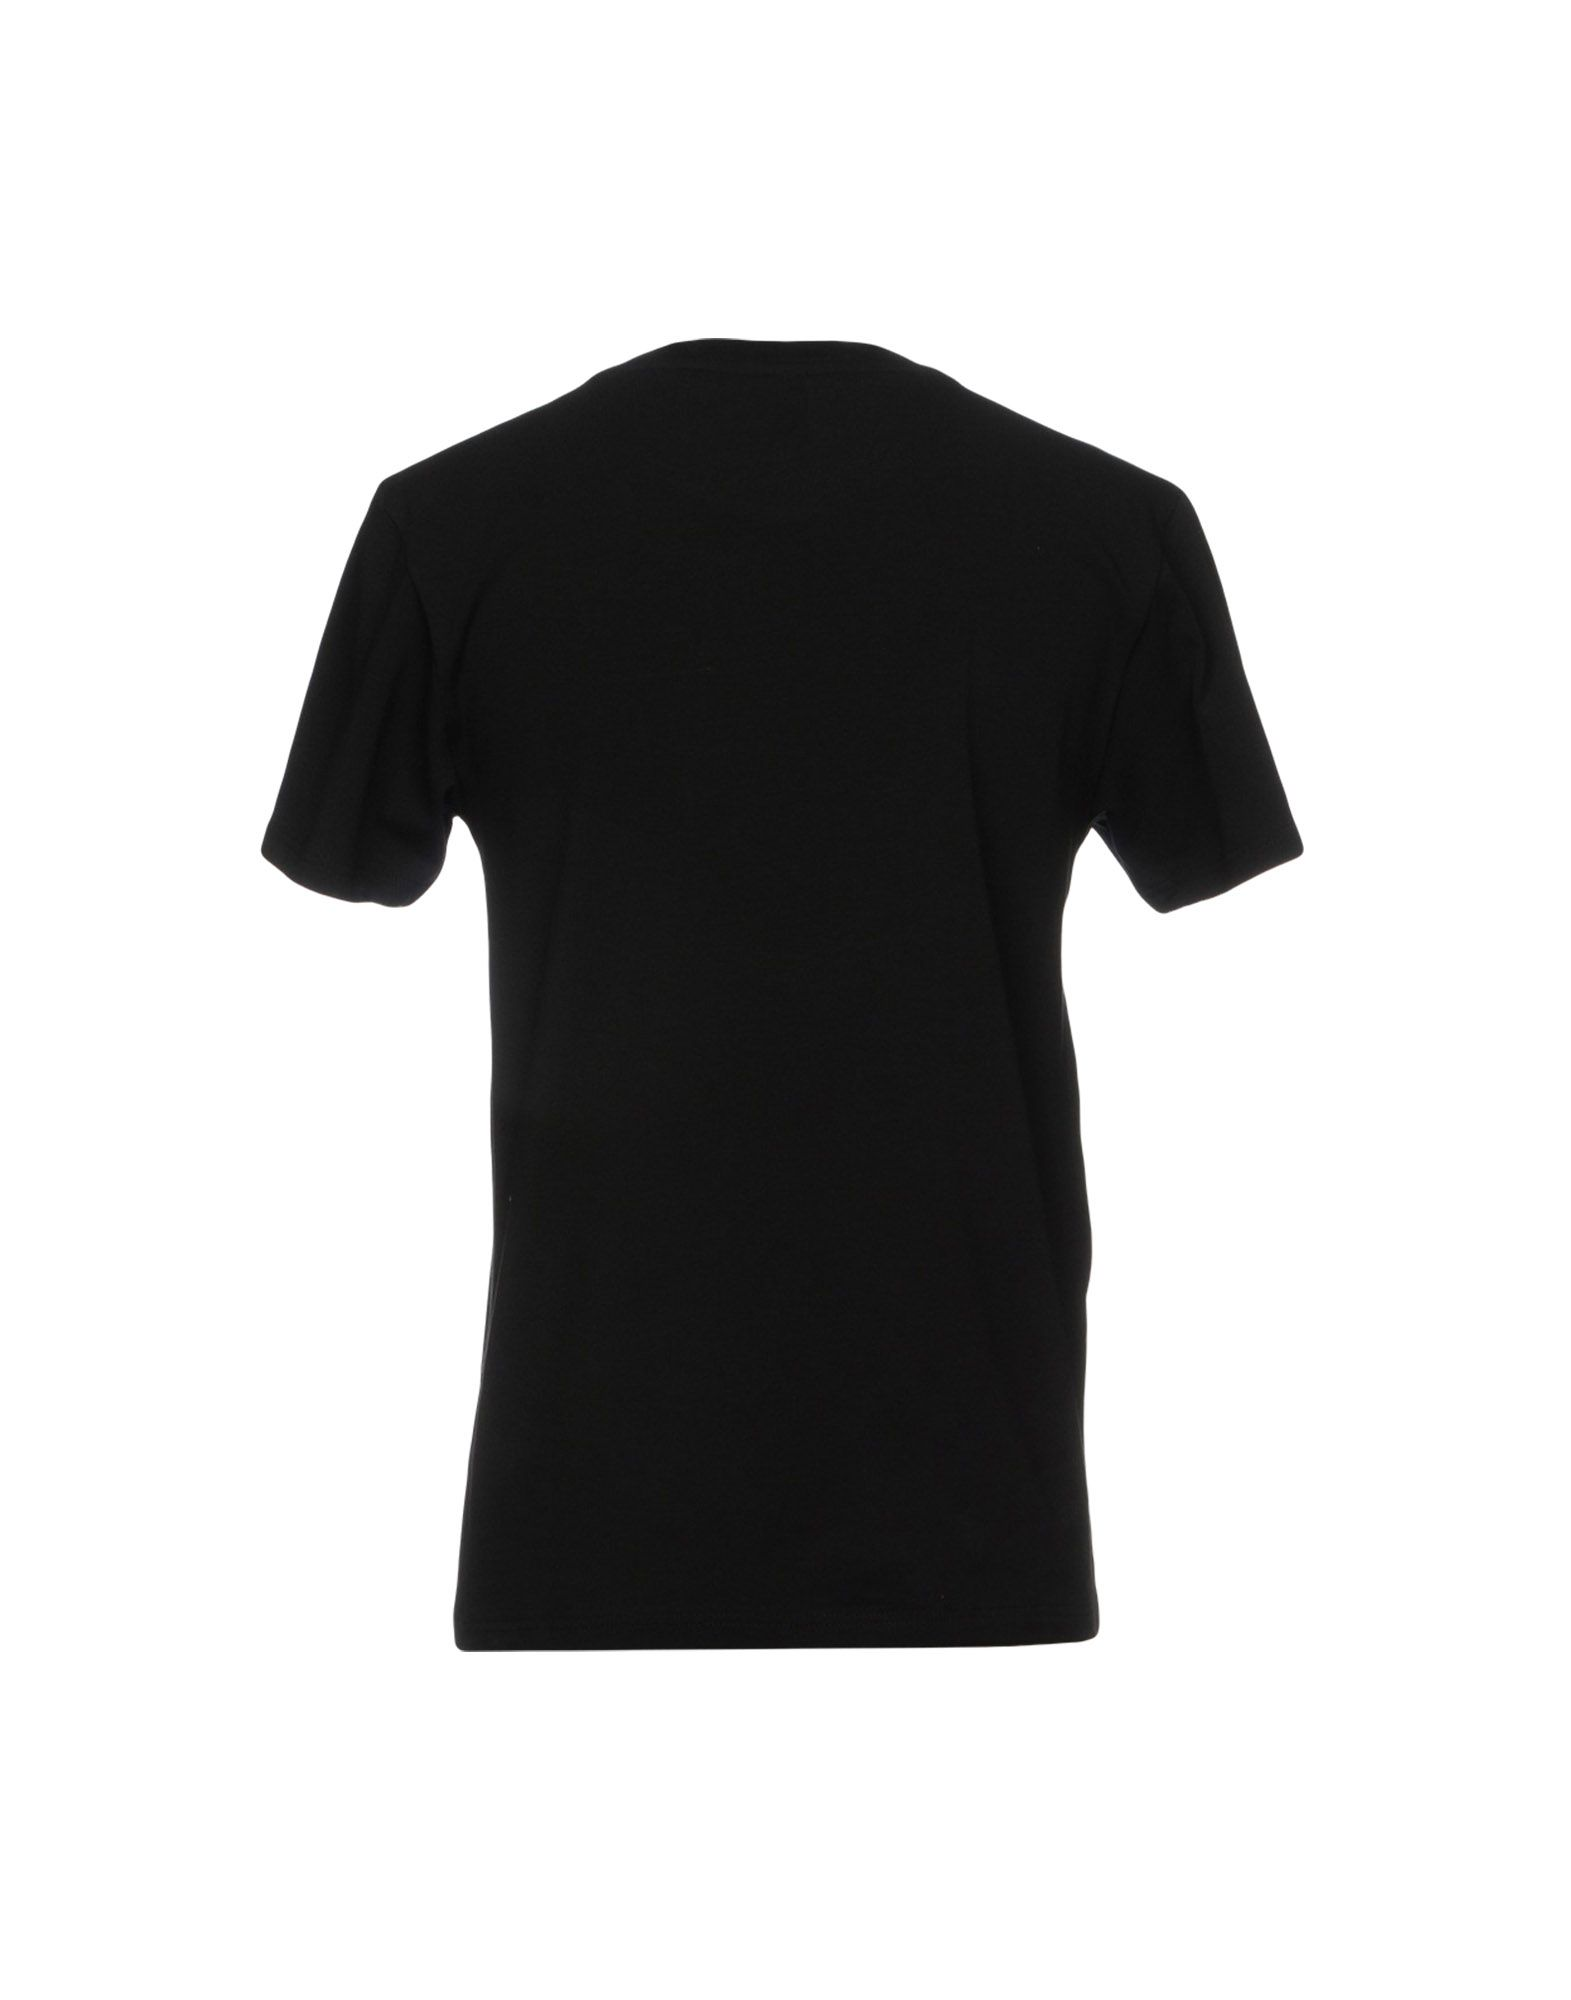 A - buon mercato A buon mercato T-Shirt Moschino Uomo - A 12089075KA b0b6d4